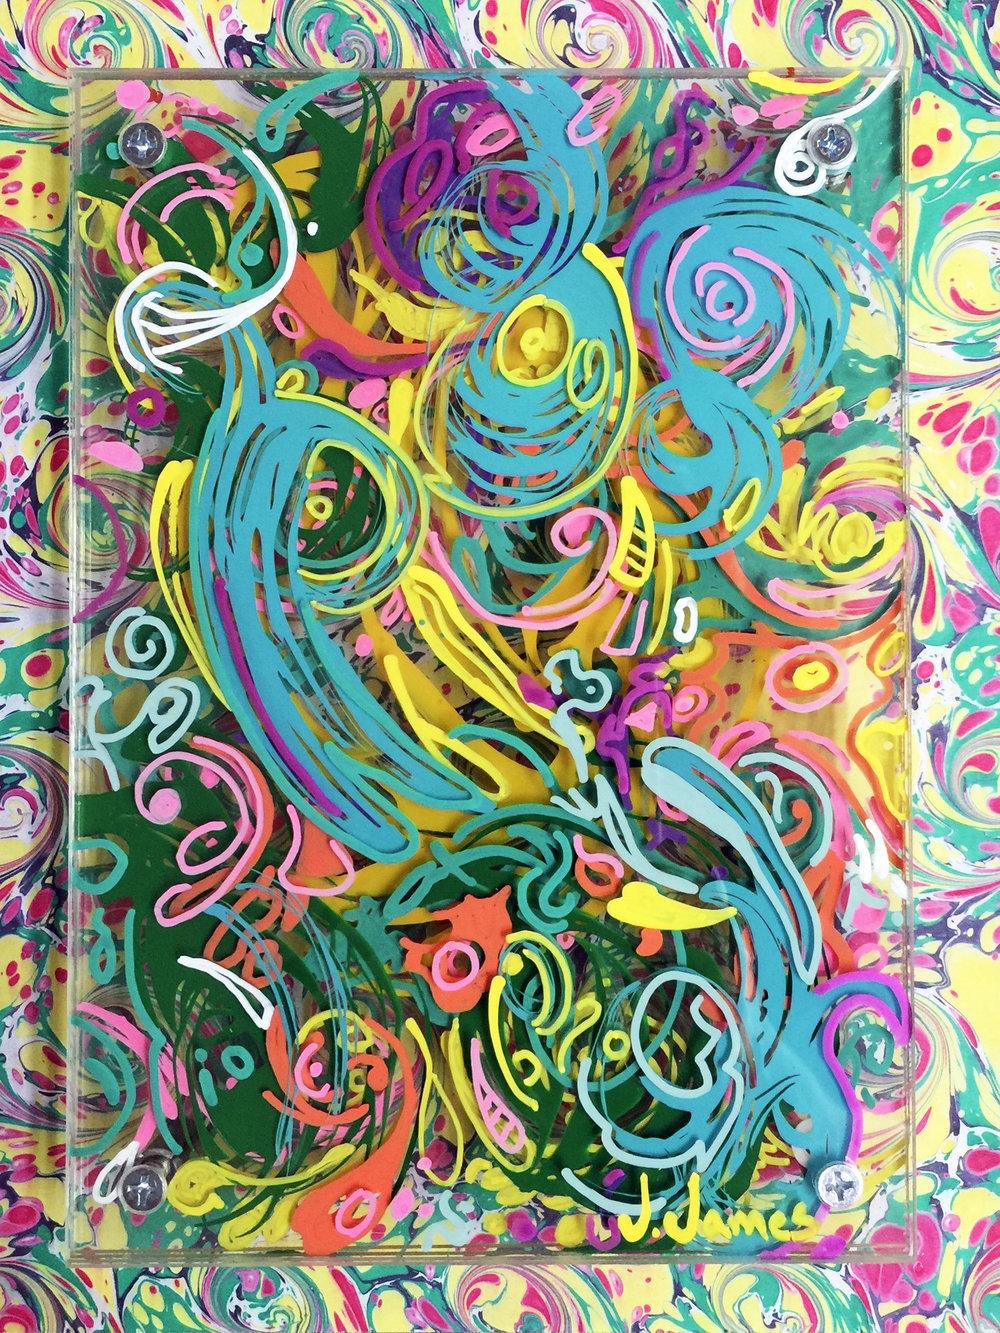 Wall Flowers, 10 x8 Mixed Media and Acrylic on Multi-Panel Acrylic